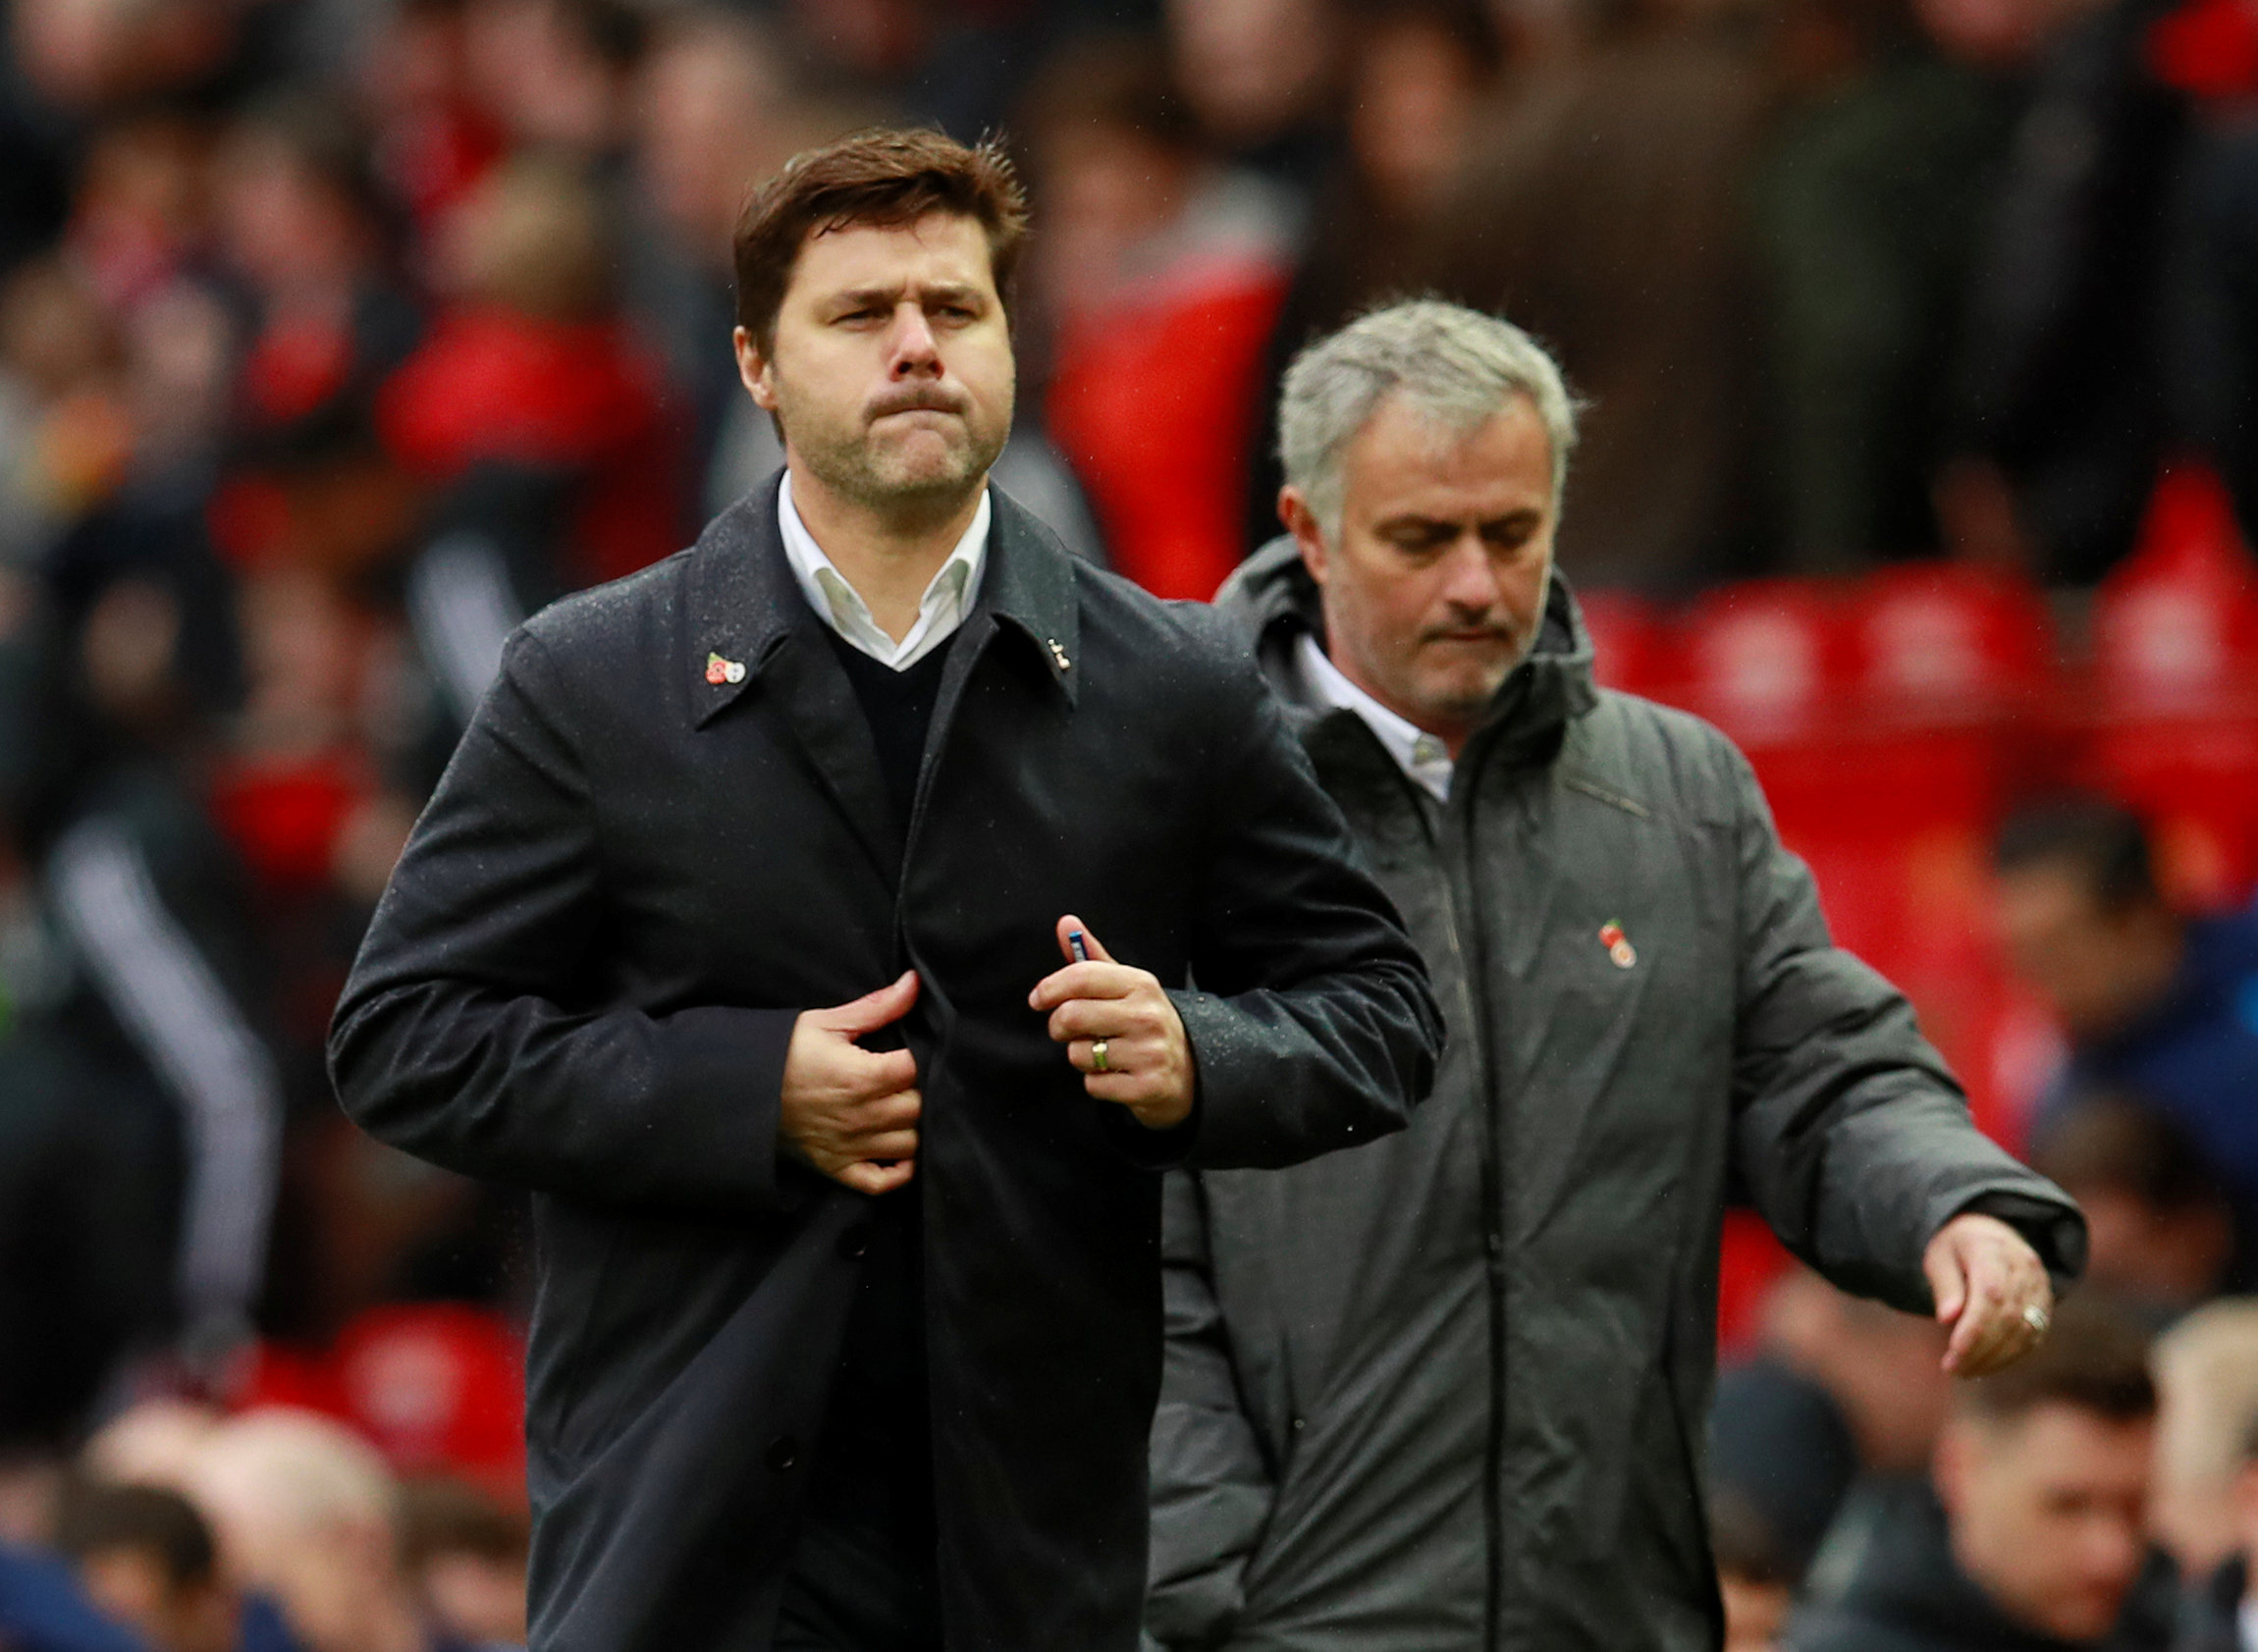 Bayern Munich prefer Tottenham's Mauricio Pochettino over Jose Mourinho